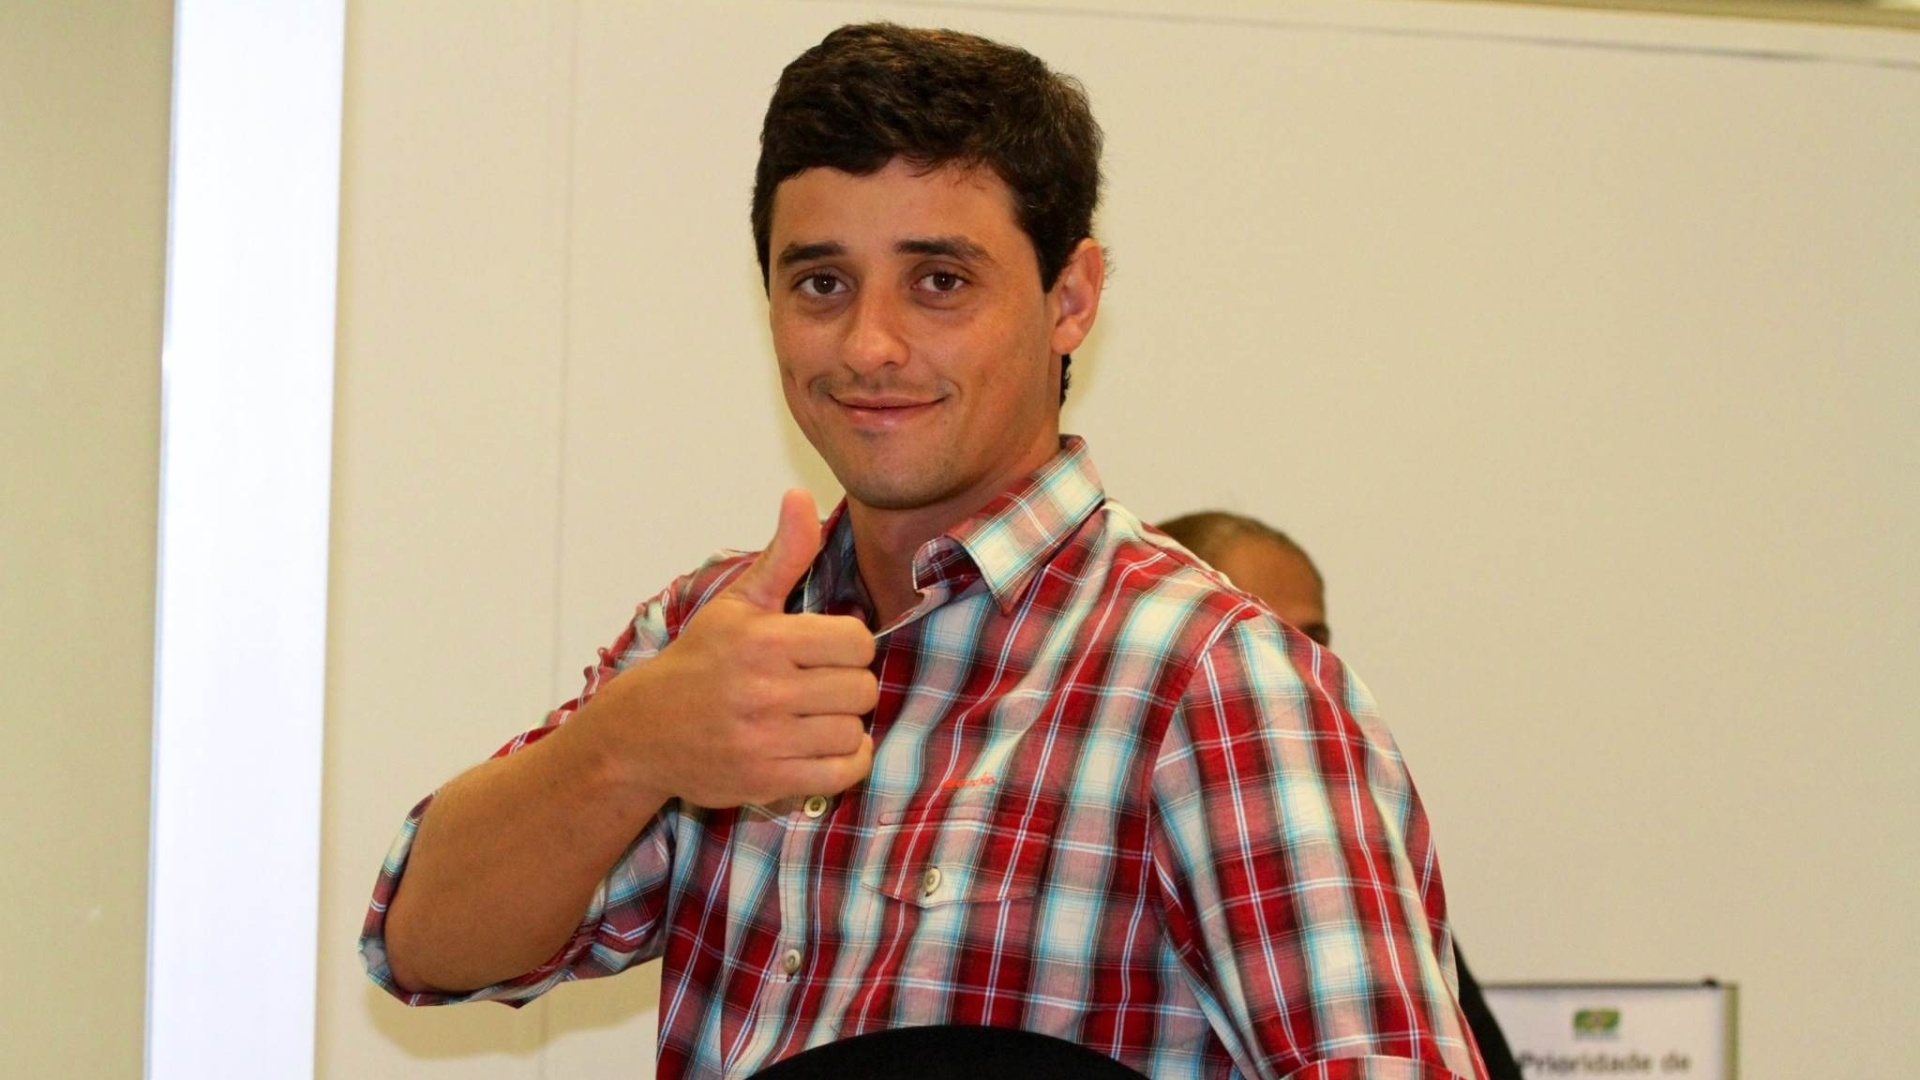 Vencedor do BBB12, Fael acena para fotógrafos no Aeroporto Santos Dumont, no Rio de Janeiro (5/4/12)